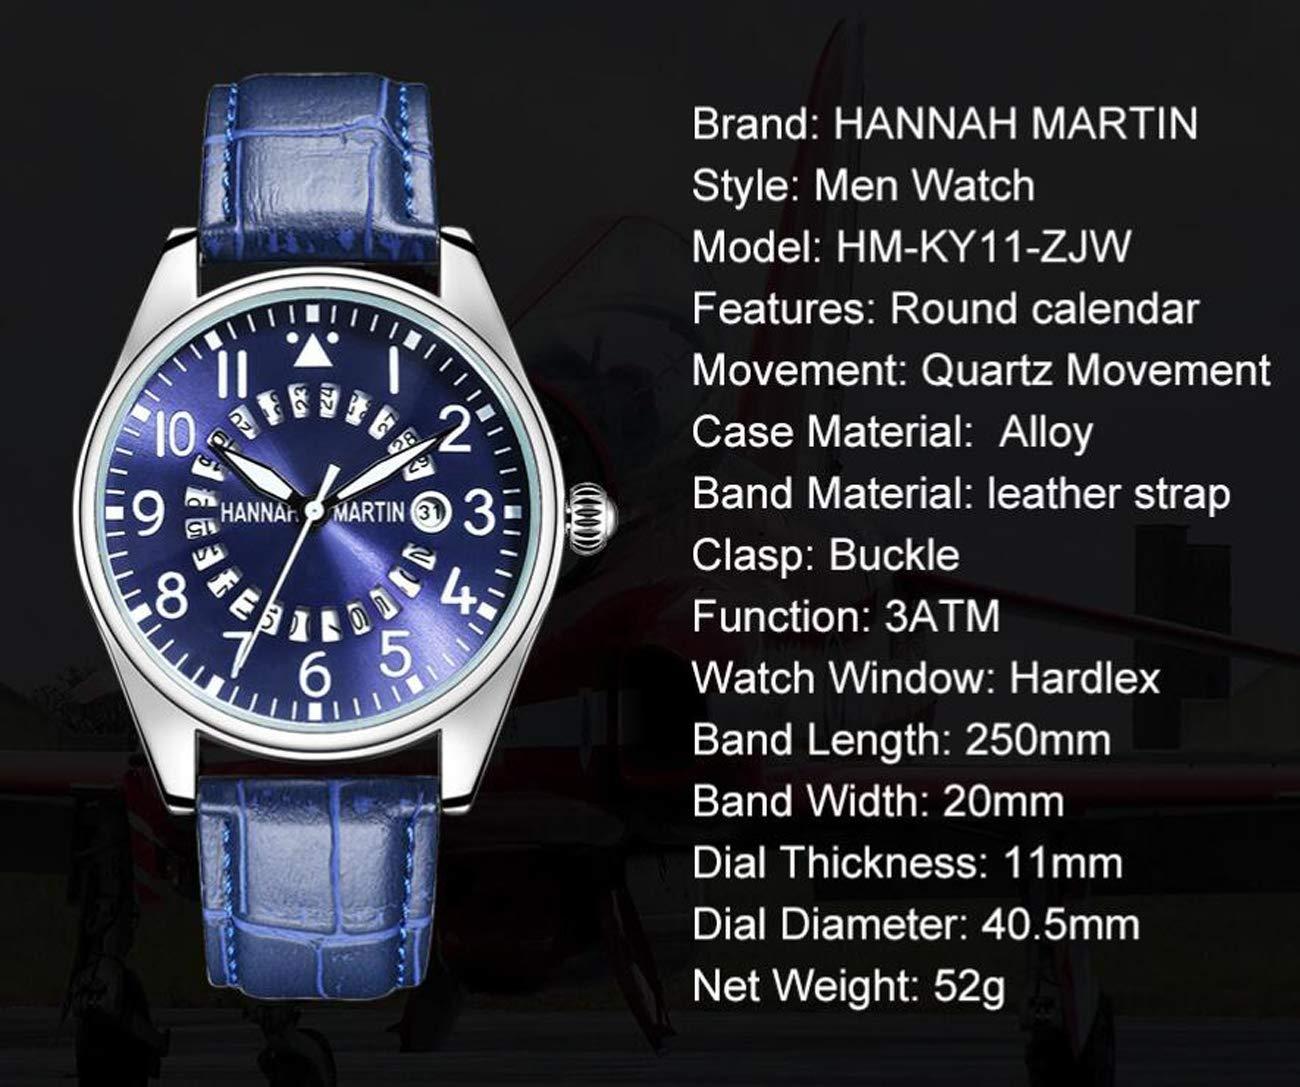 Hannah Martin Electronic Pilot Relojes de Pulsera con Calendario Impermeable y Correa de Cuero para Hombres,LYL: Amazon.es: Electrónica